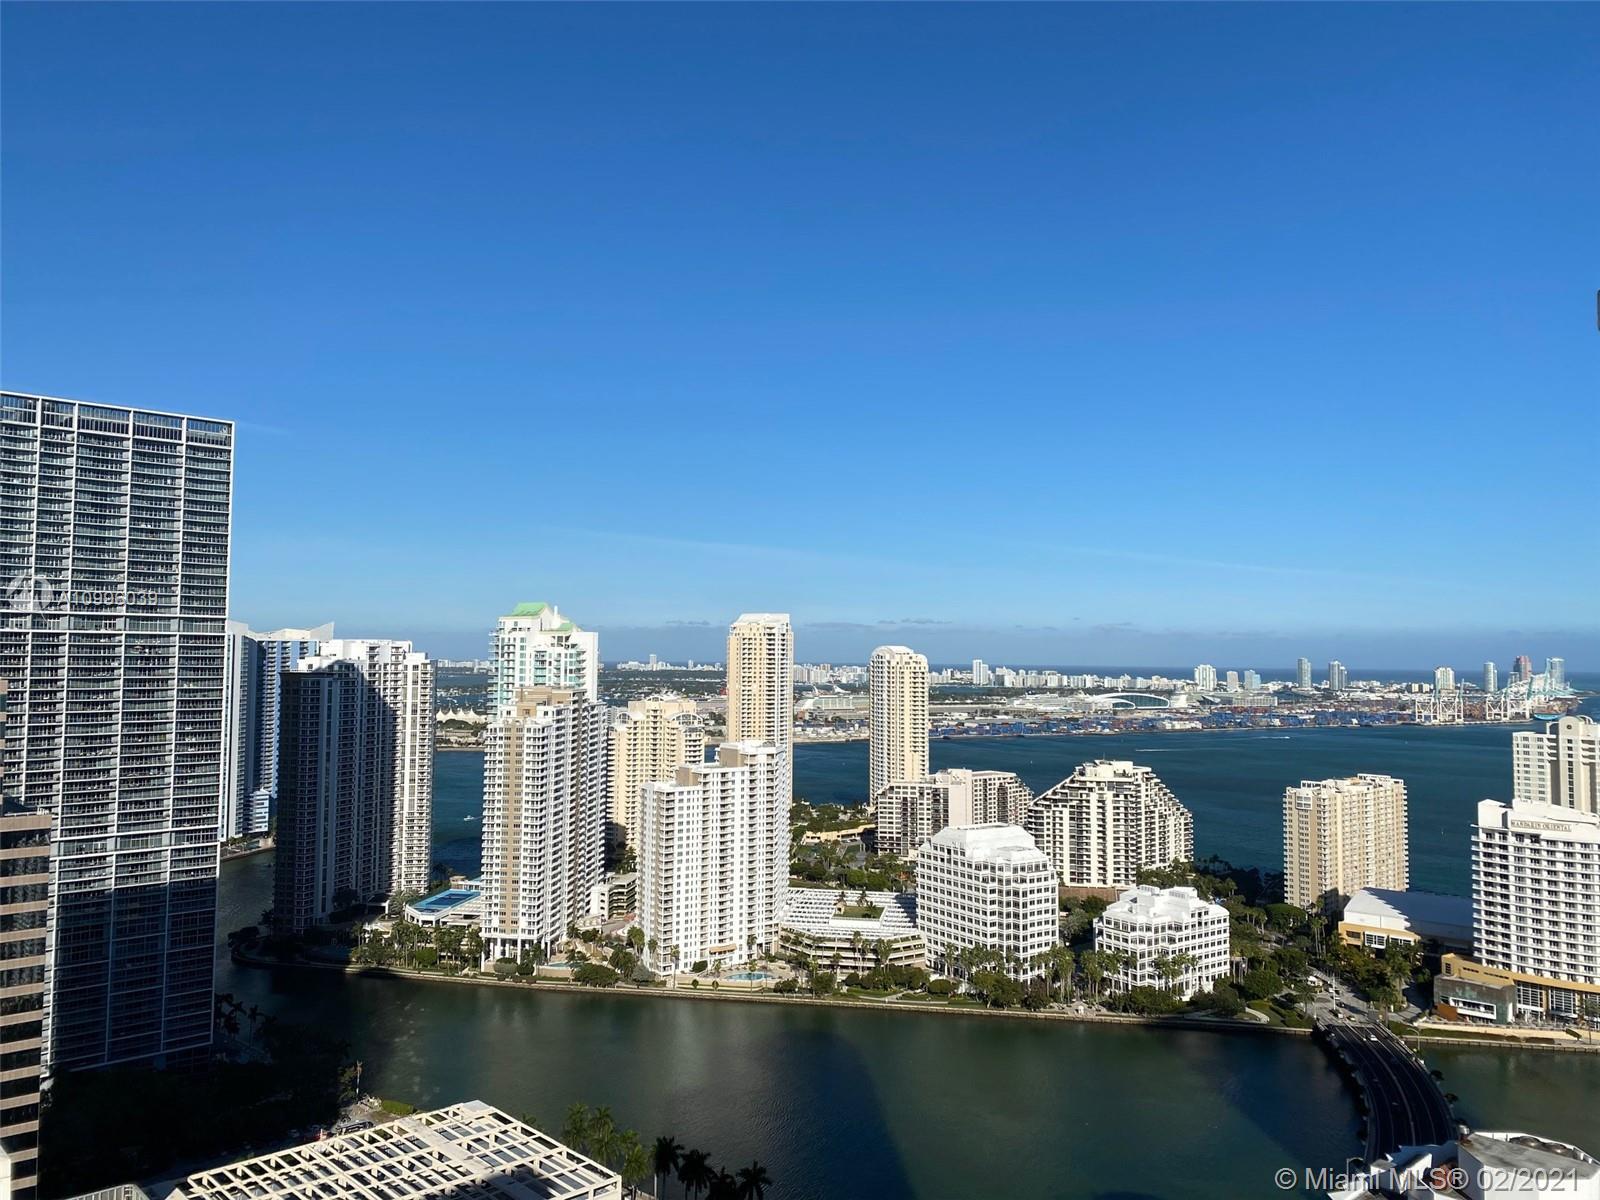 The Plaza on Brickell 1 #4002 - 950 SE Brickell Bay Dr #4002, Miami, FL 33131